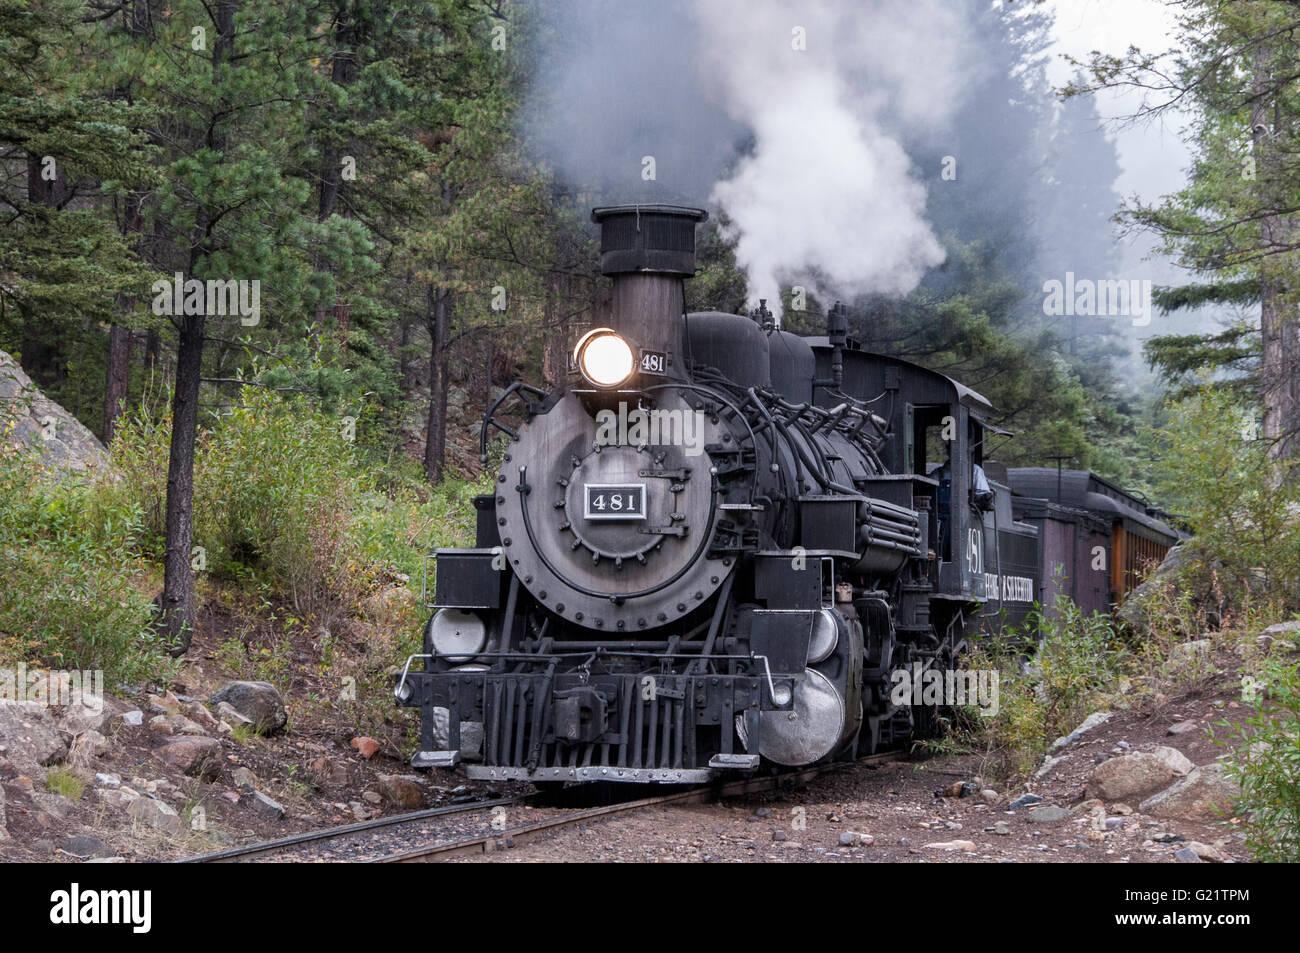 Locomotive 481, Durango & Silverton Narrow Gauge Railroad, Needleton, San Juan National Forest, Colorado. - Stock Image